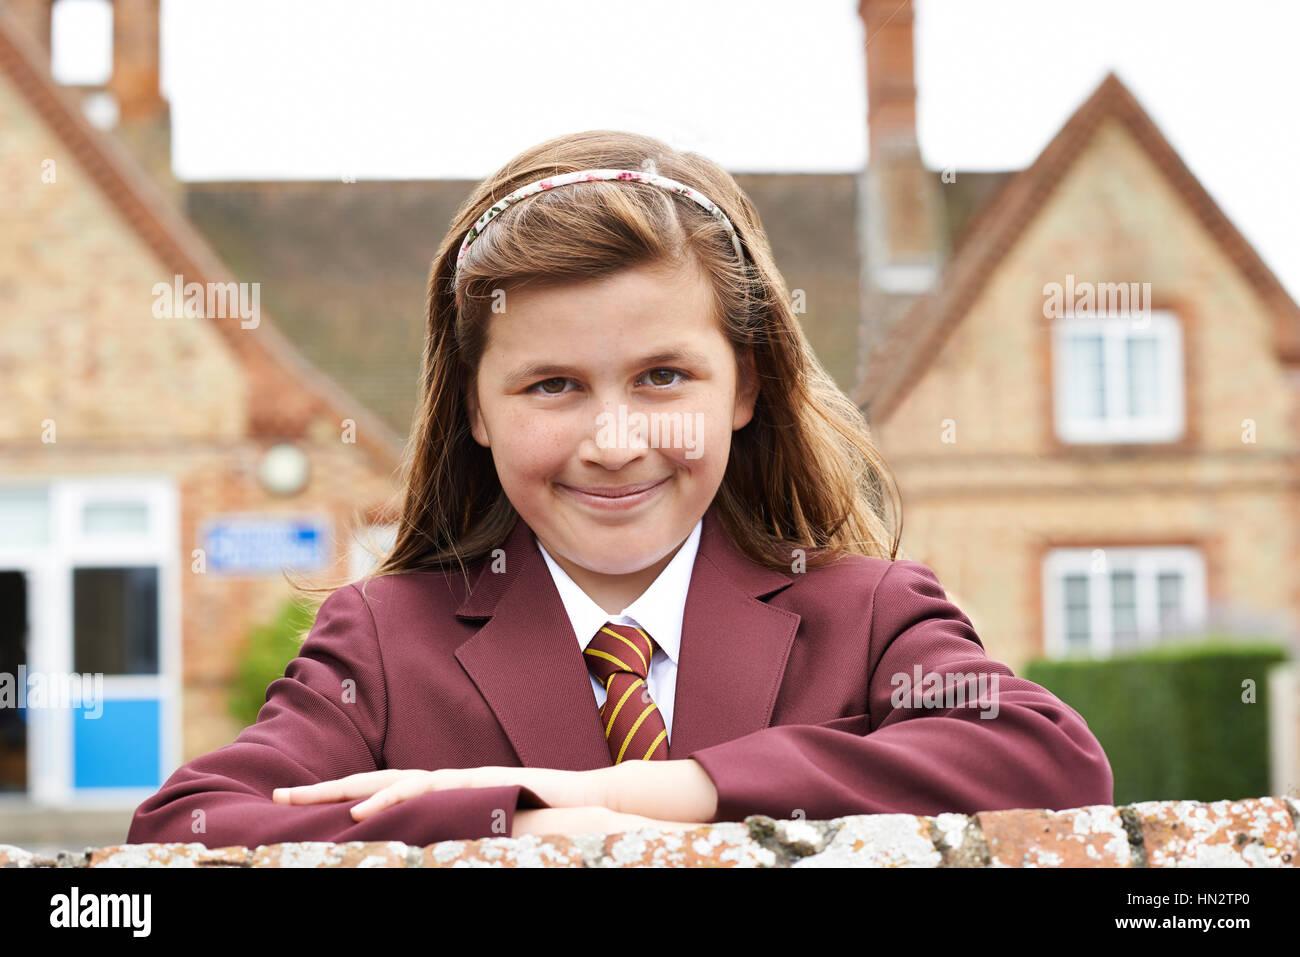 Portrait Of Girl In Uniform Outside School Building - Stock Image